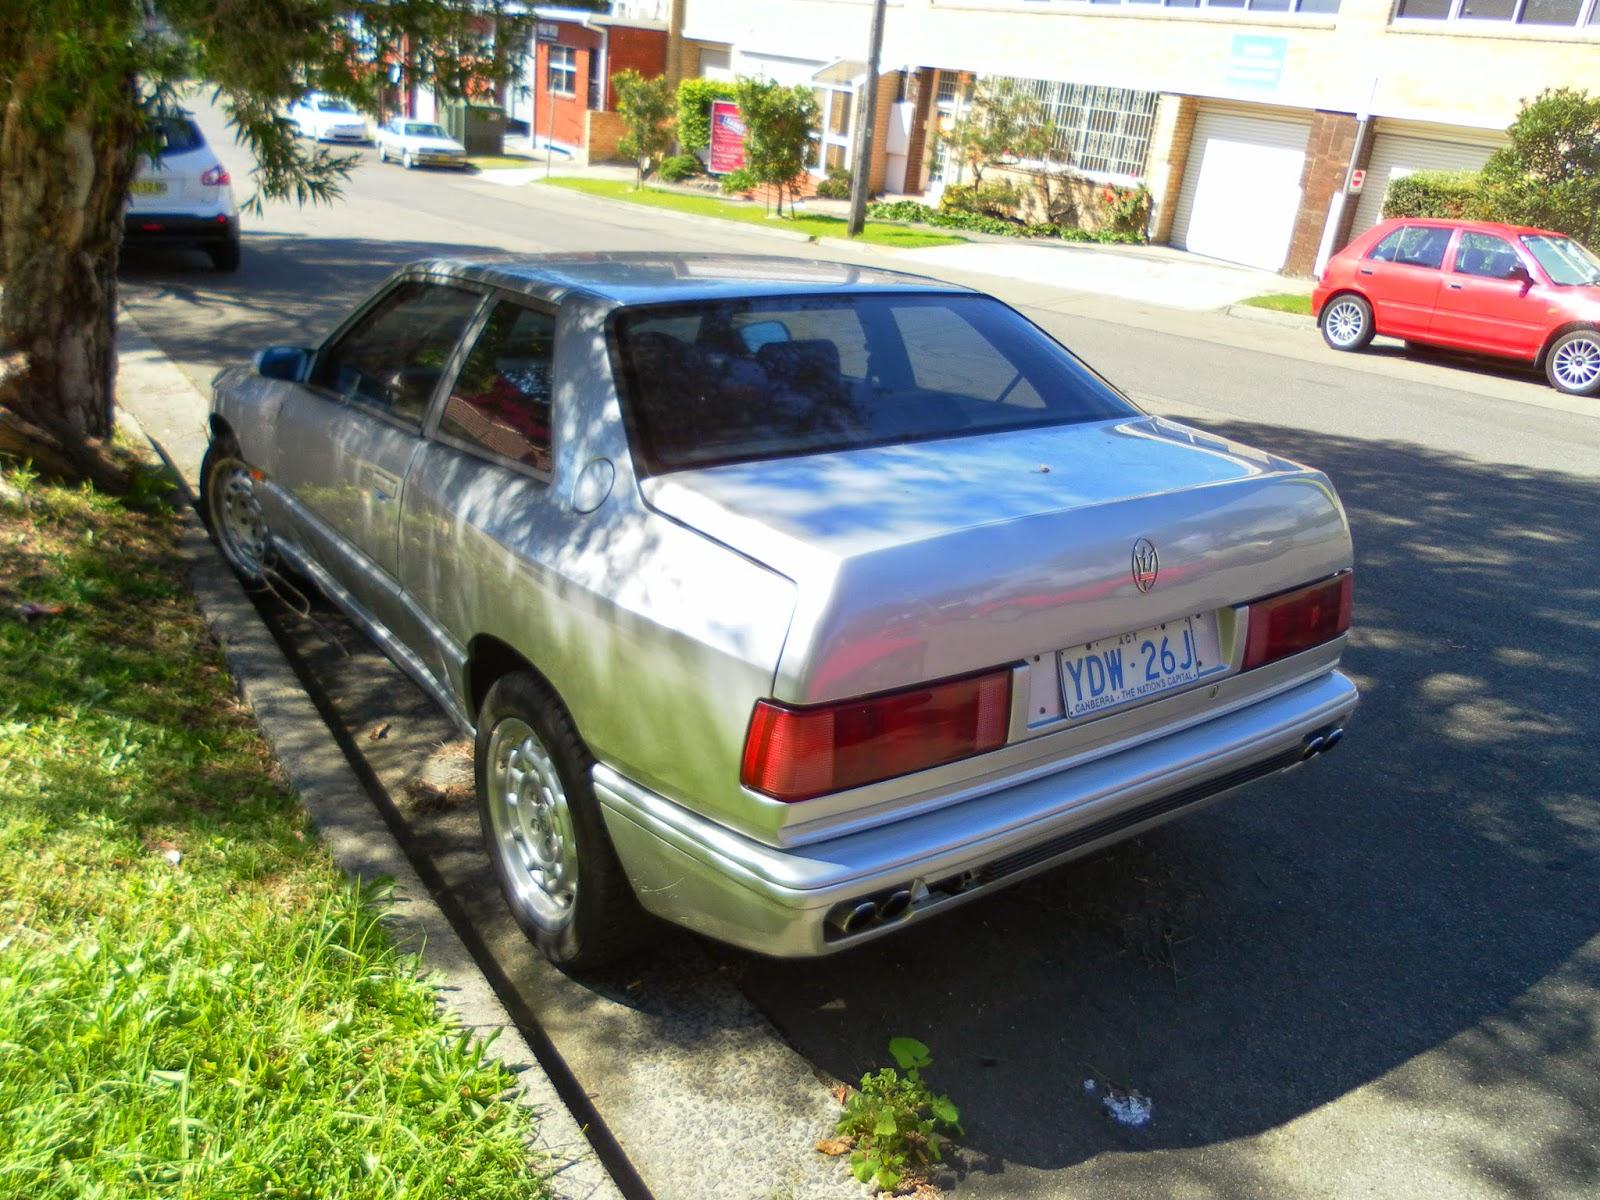 Aussie Old Parked Cars: 1995 Maserati Ghibli II